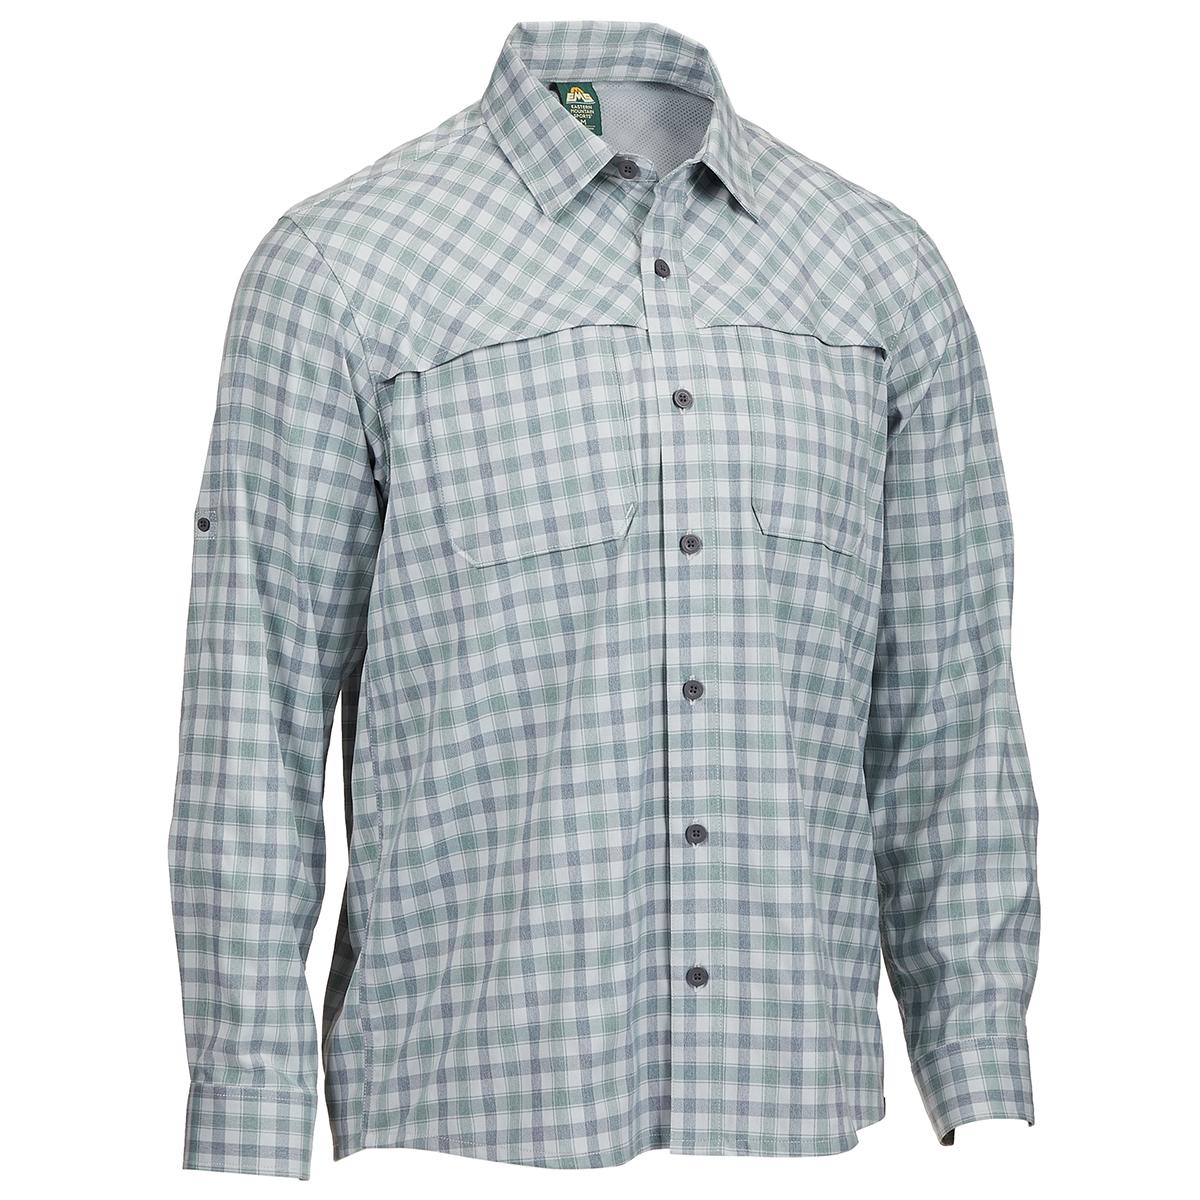 Ems Men's Journey Plaid Long-Sleeve Shirt - Brown, S